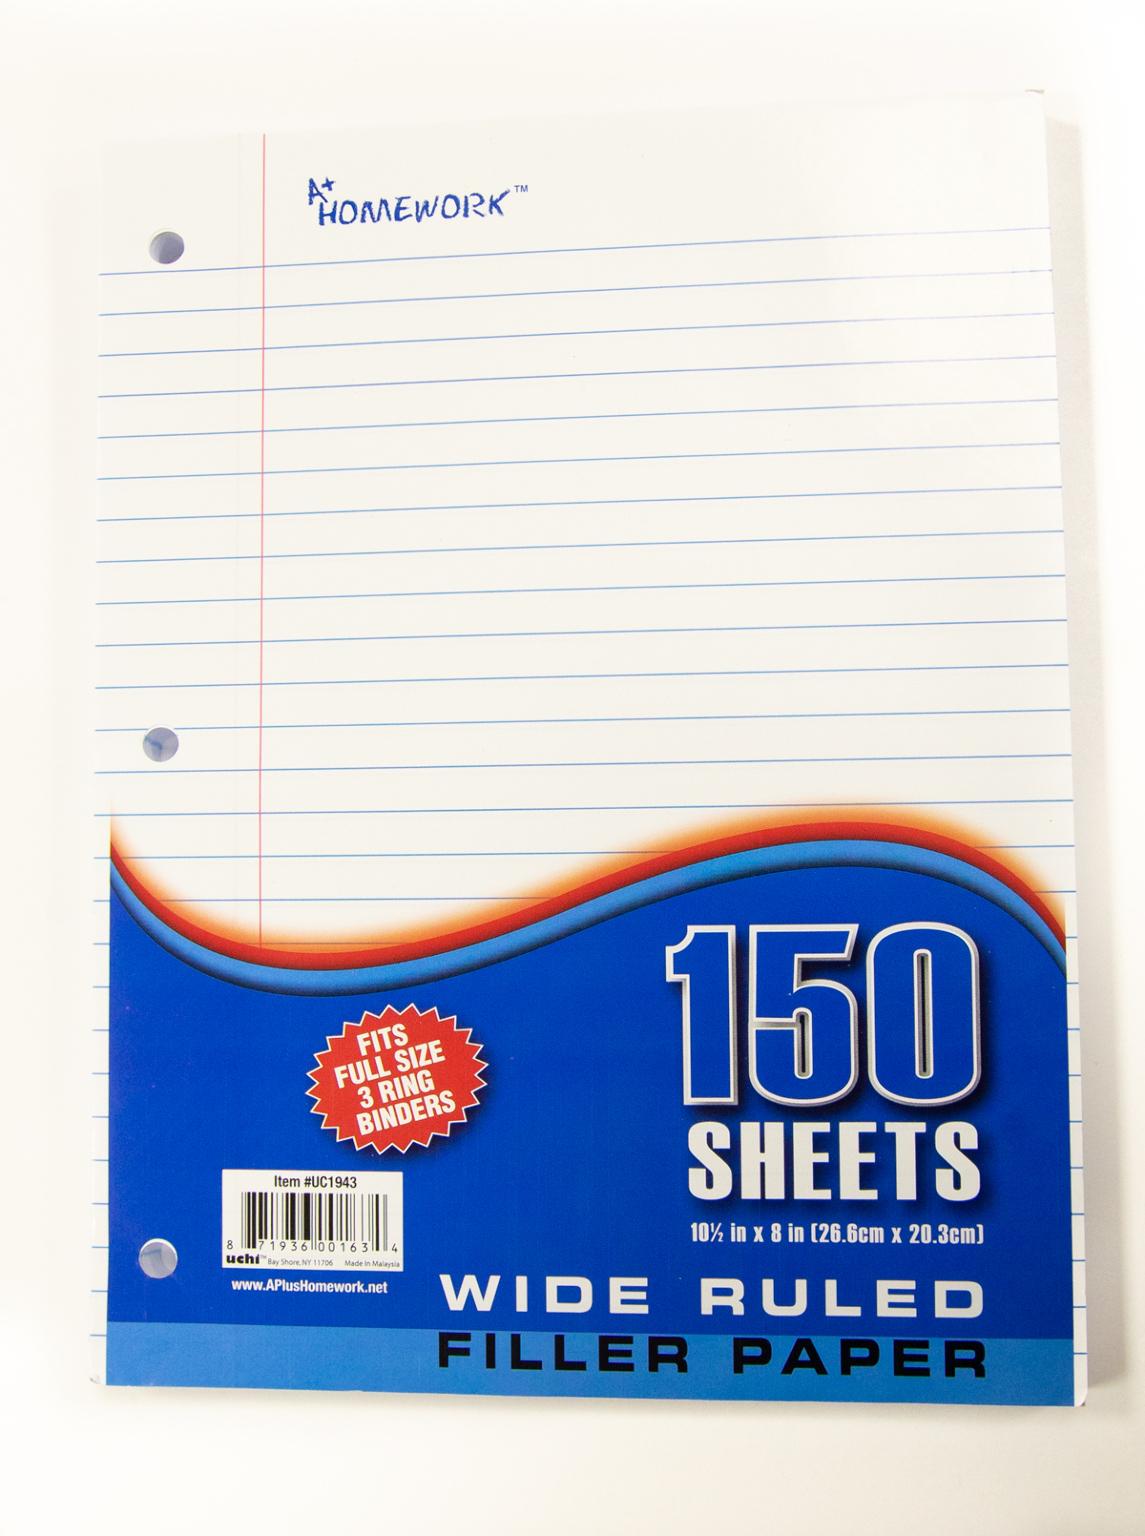 Wholesale Filler Paper - College Ruled Sheets — blogger.com